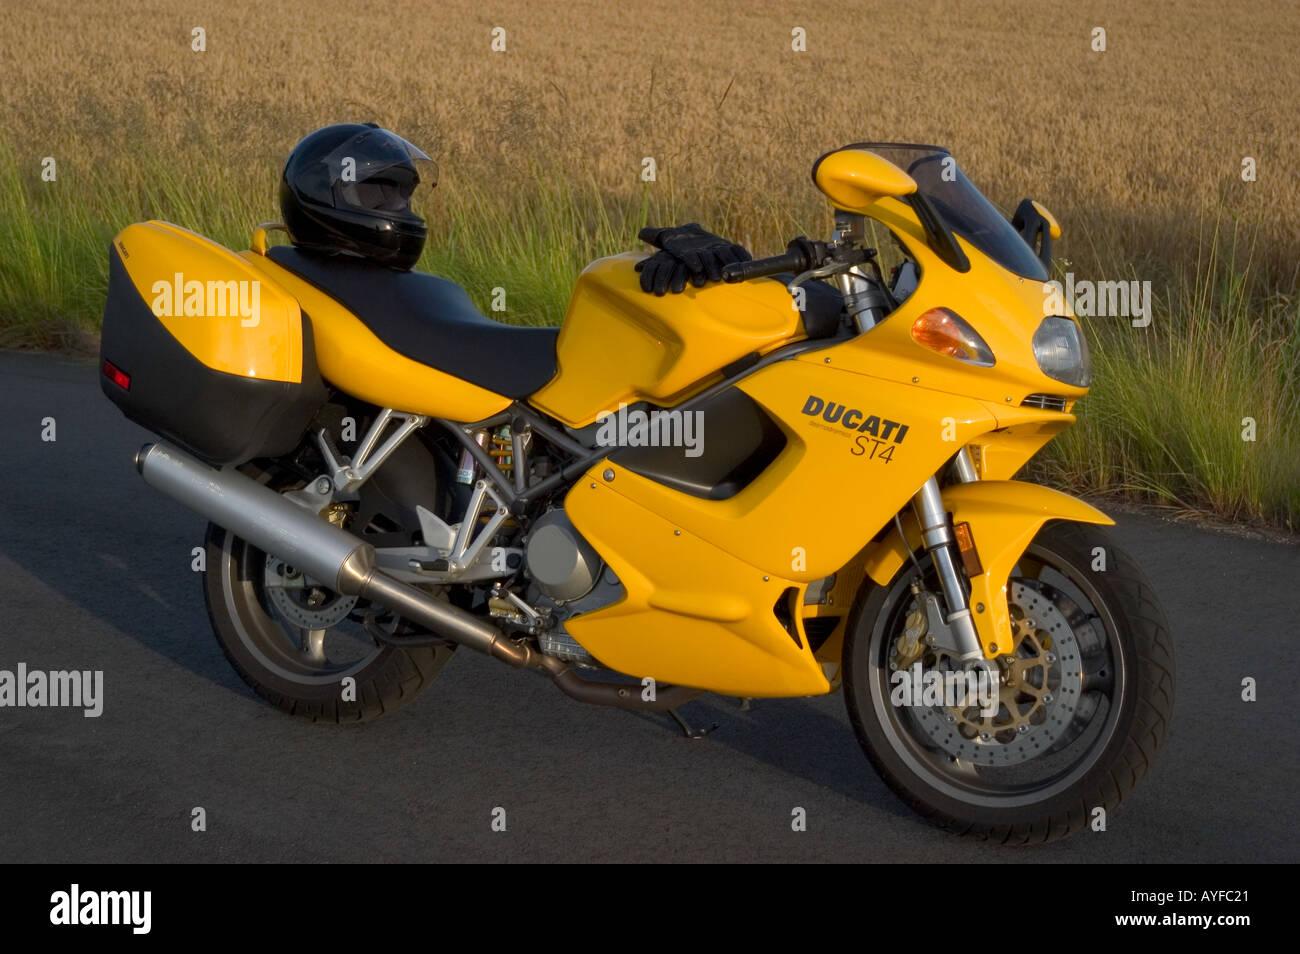 Ducati Motorcycle and Helmet - Stock Image